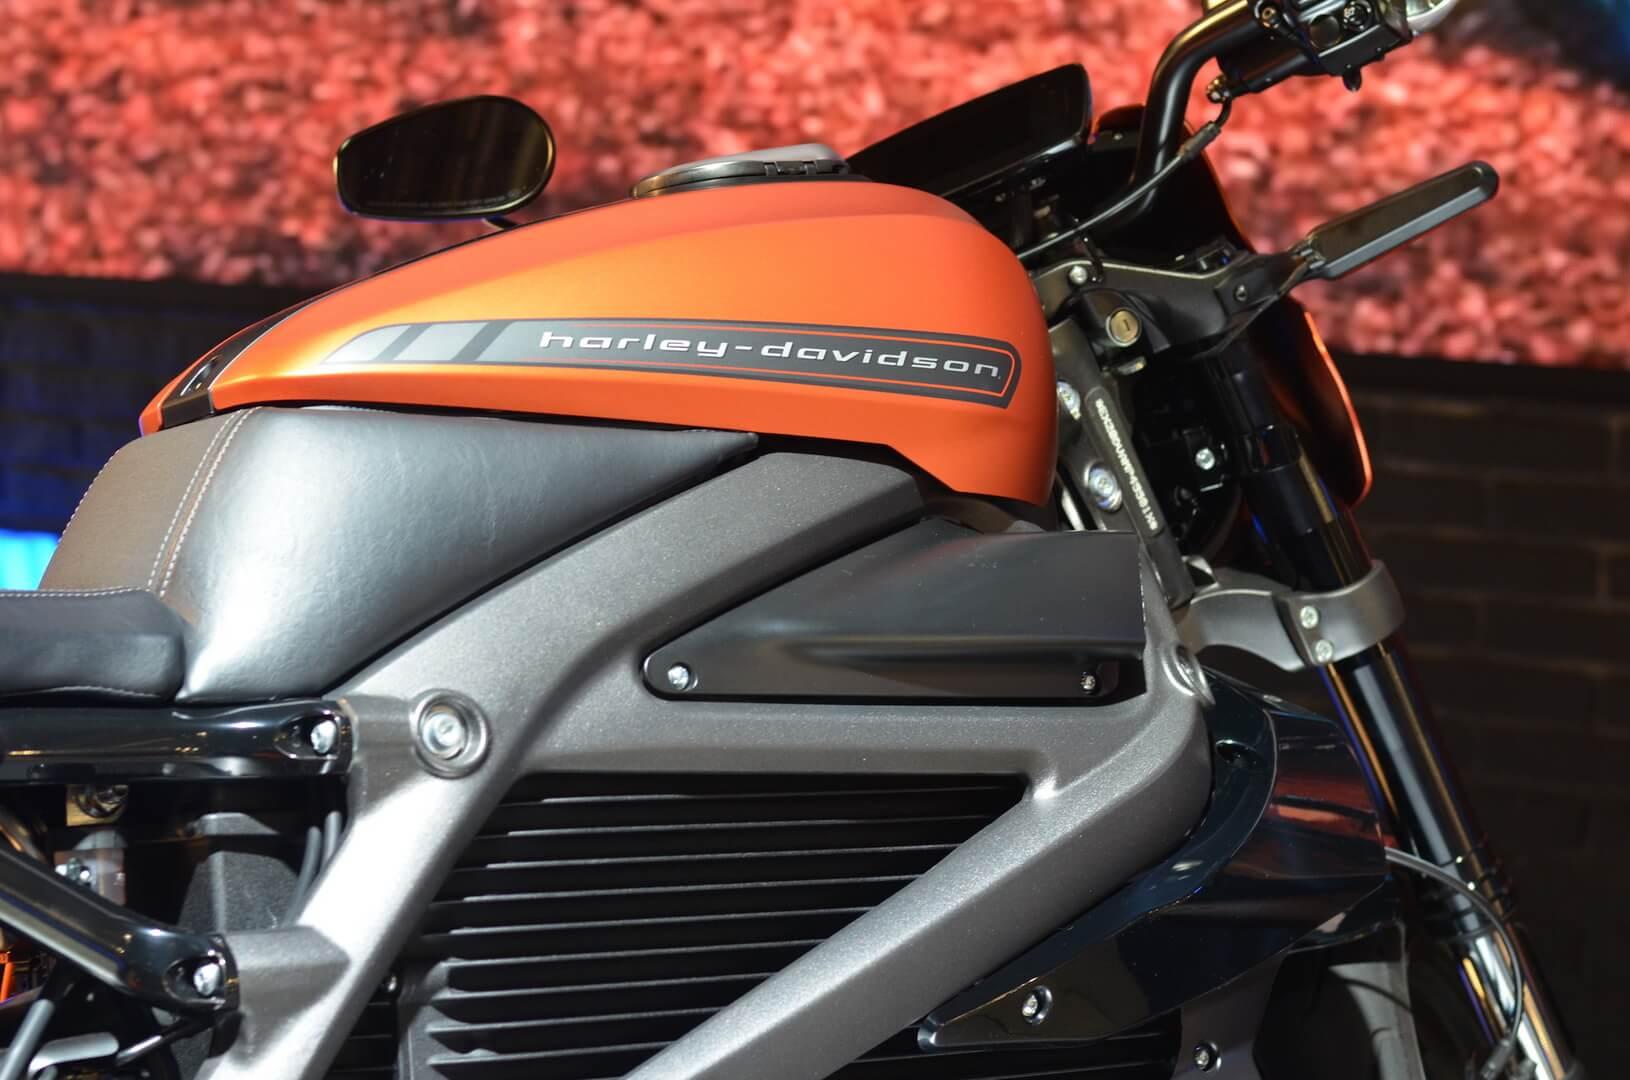 Электрический мотоцикл Harley-Davidson LiveWire на мотовыставке EICMA в Милане